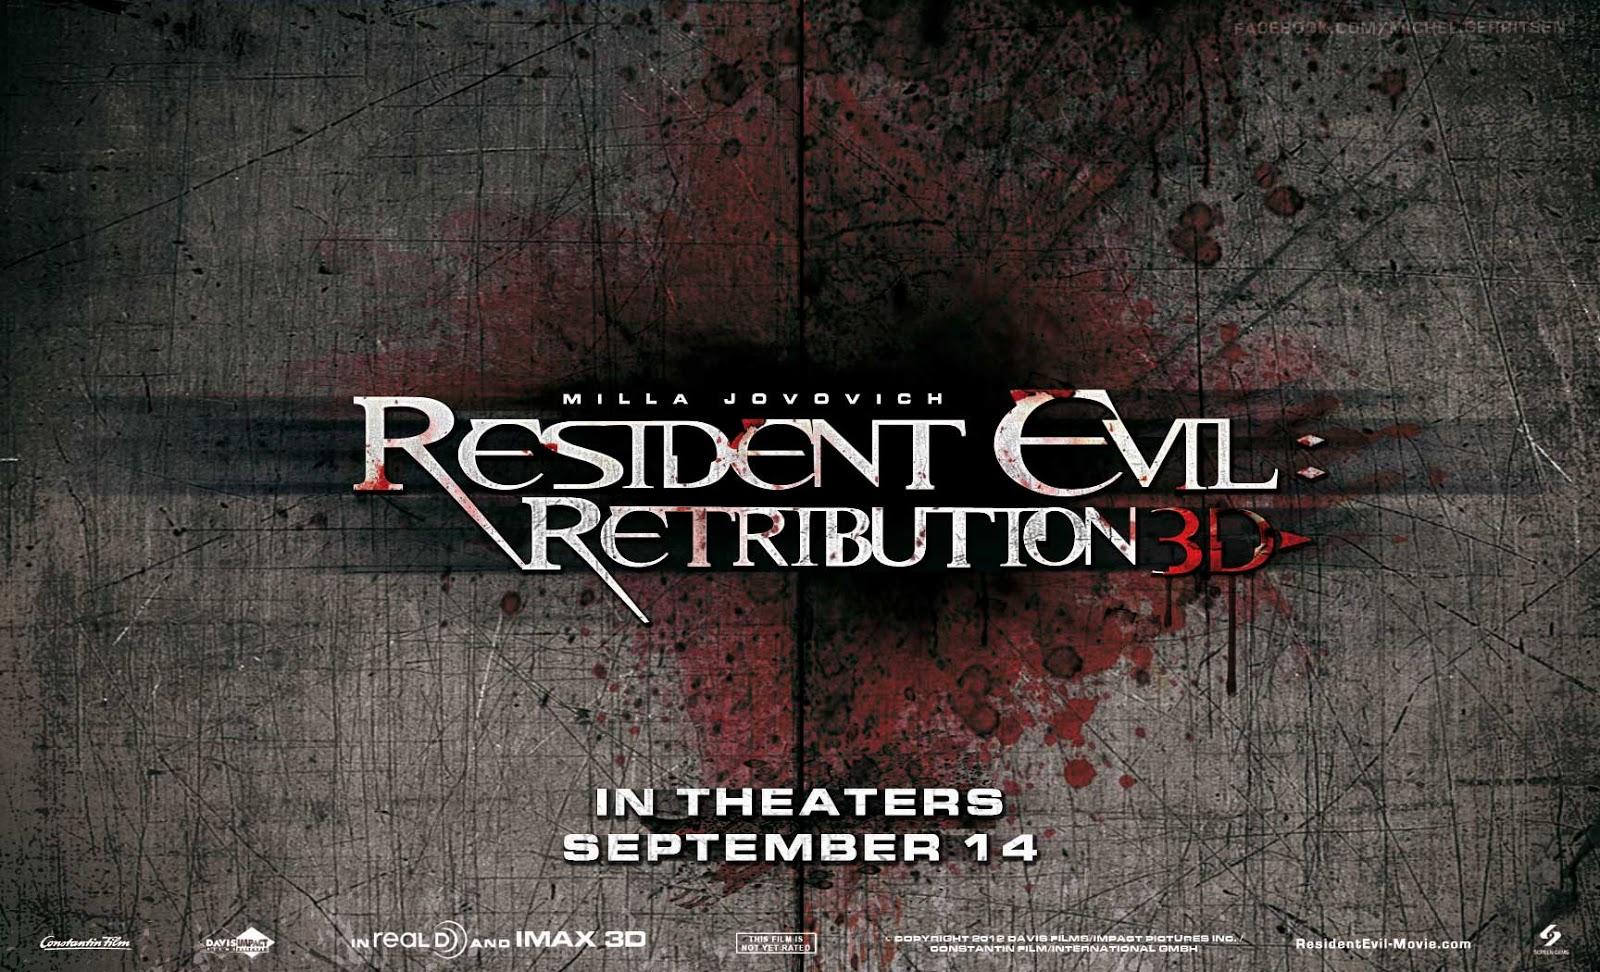 http://4.bp.blogspot.com/-yG5QnDXHMg4/ULicONLDI-I/AAAAAAAAAYQ/duCh8YPfbIA/s1600/resident-evil-retribution.jpg